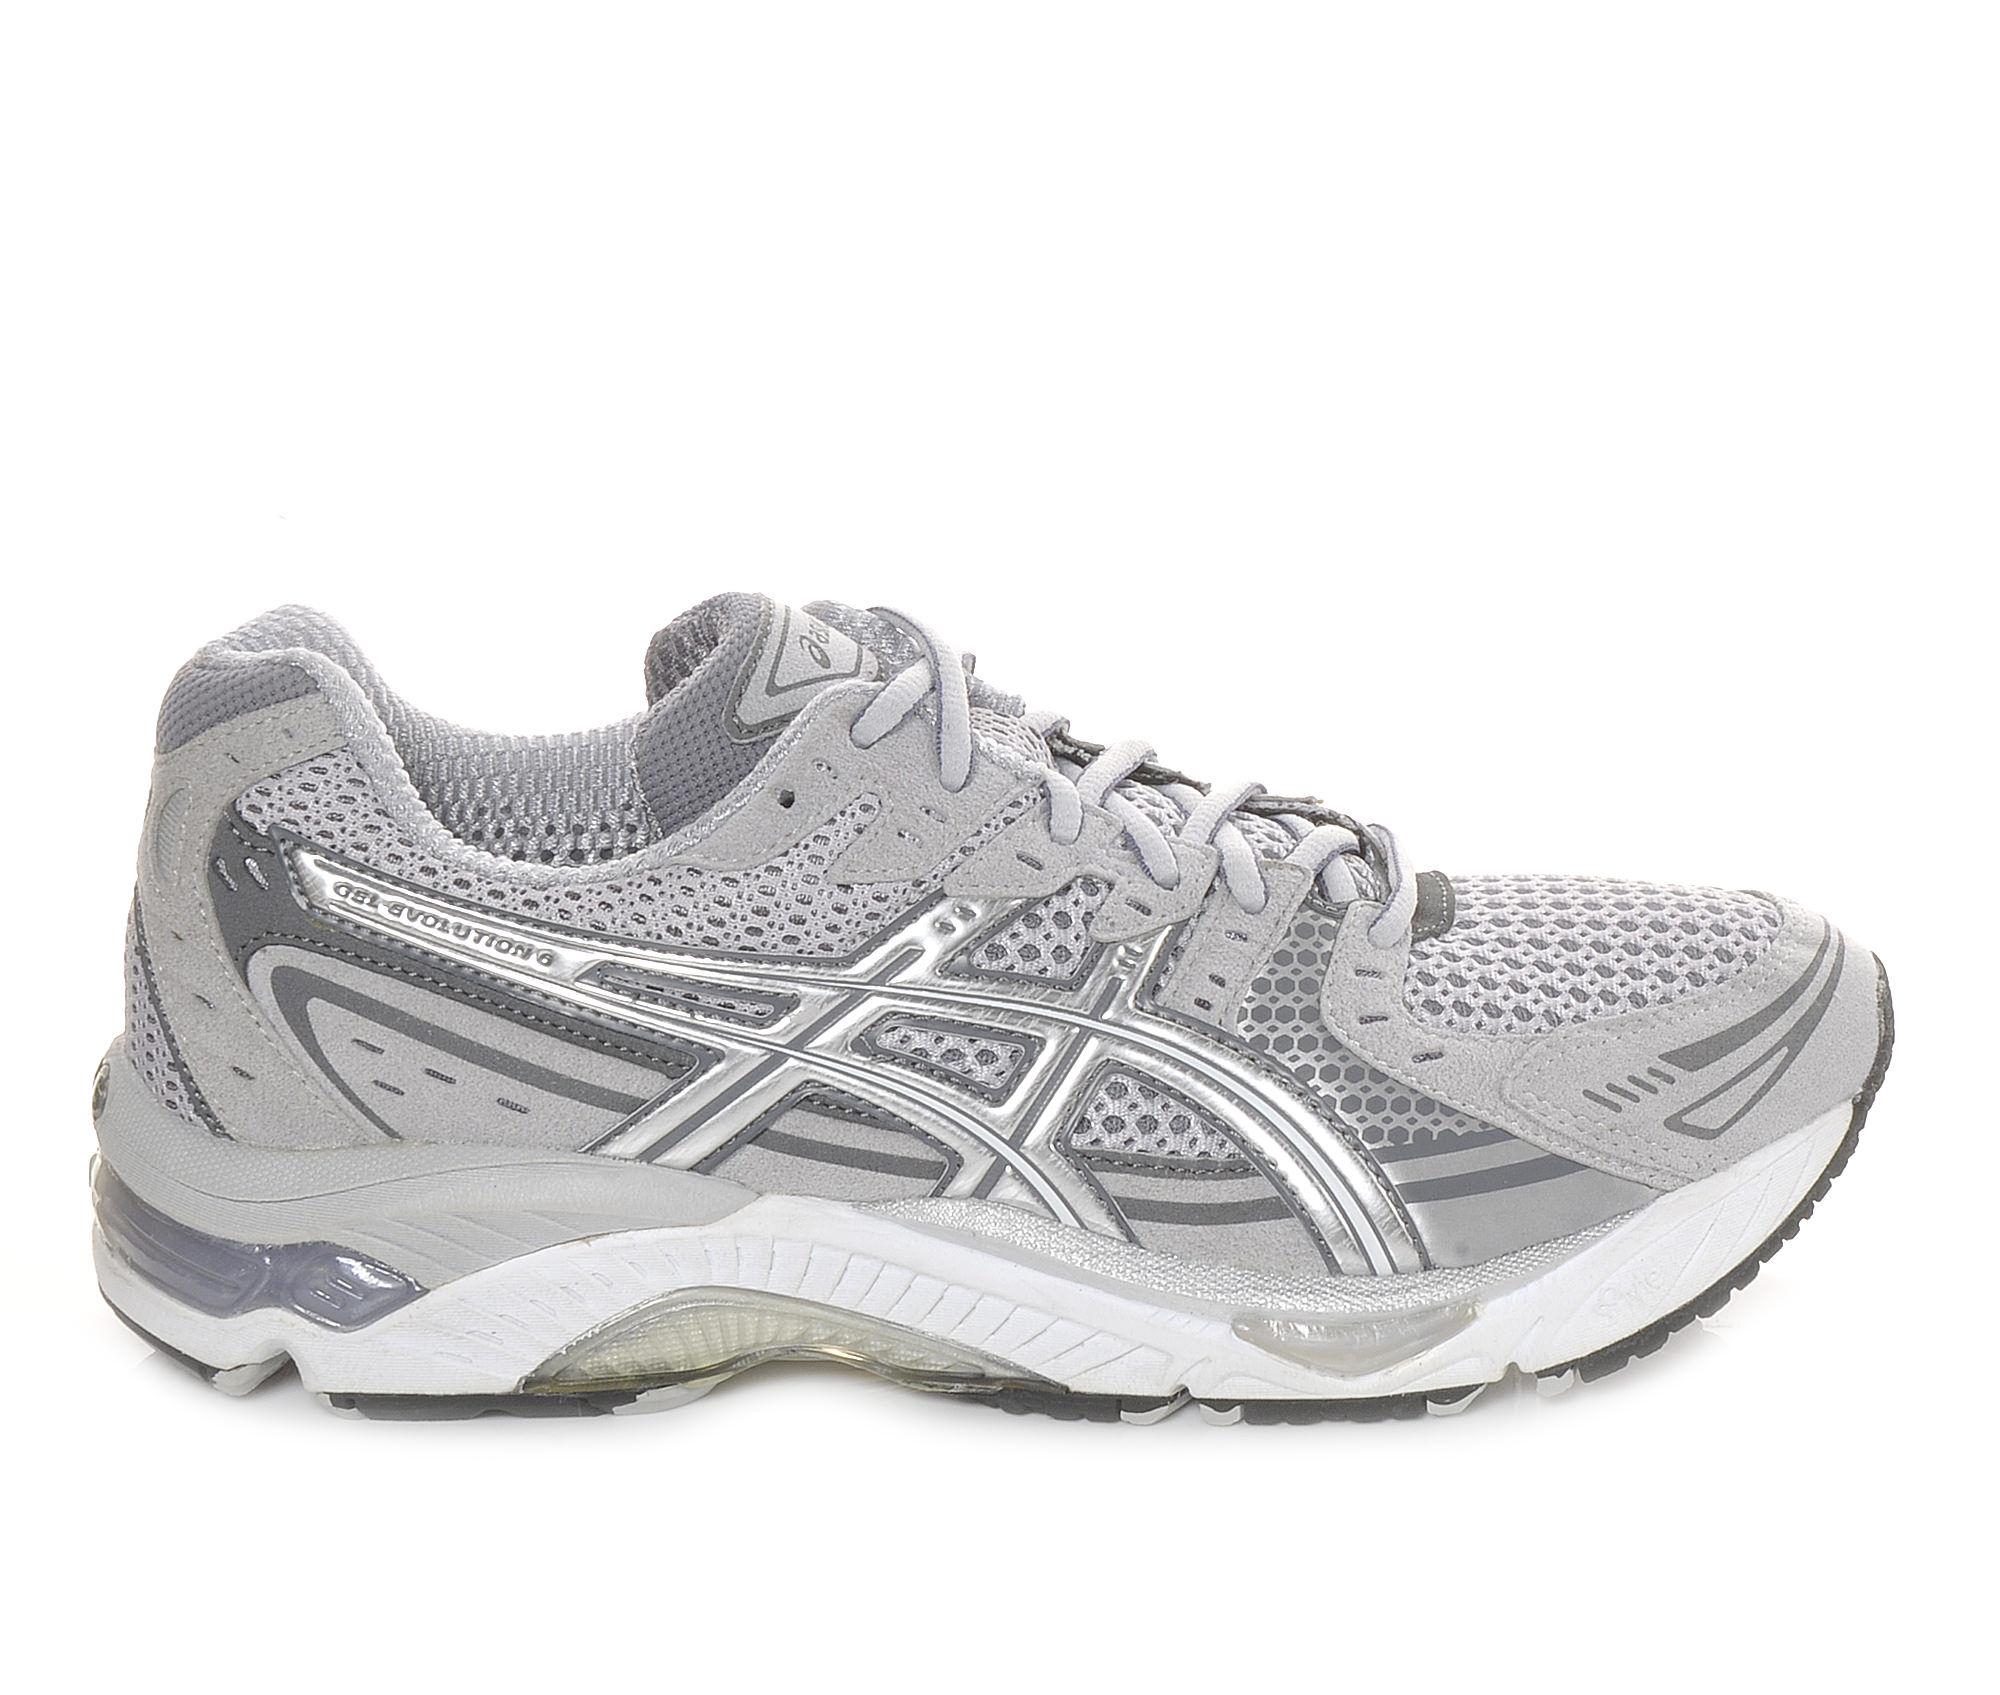 Men's ASICS Gel Evolution 6 Running Shoes Grey